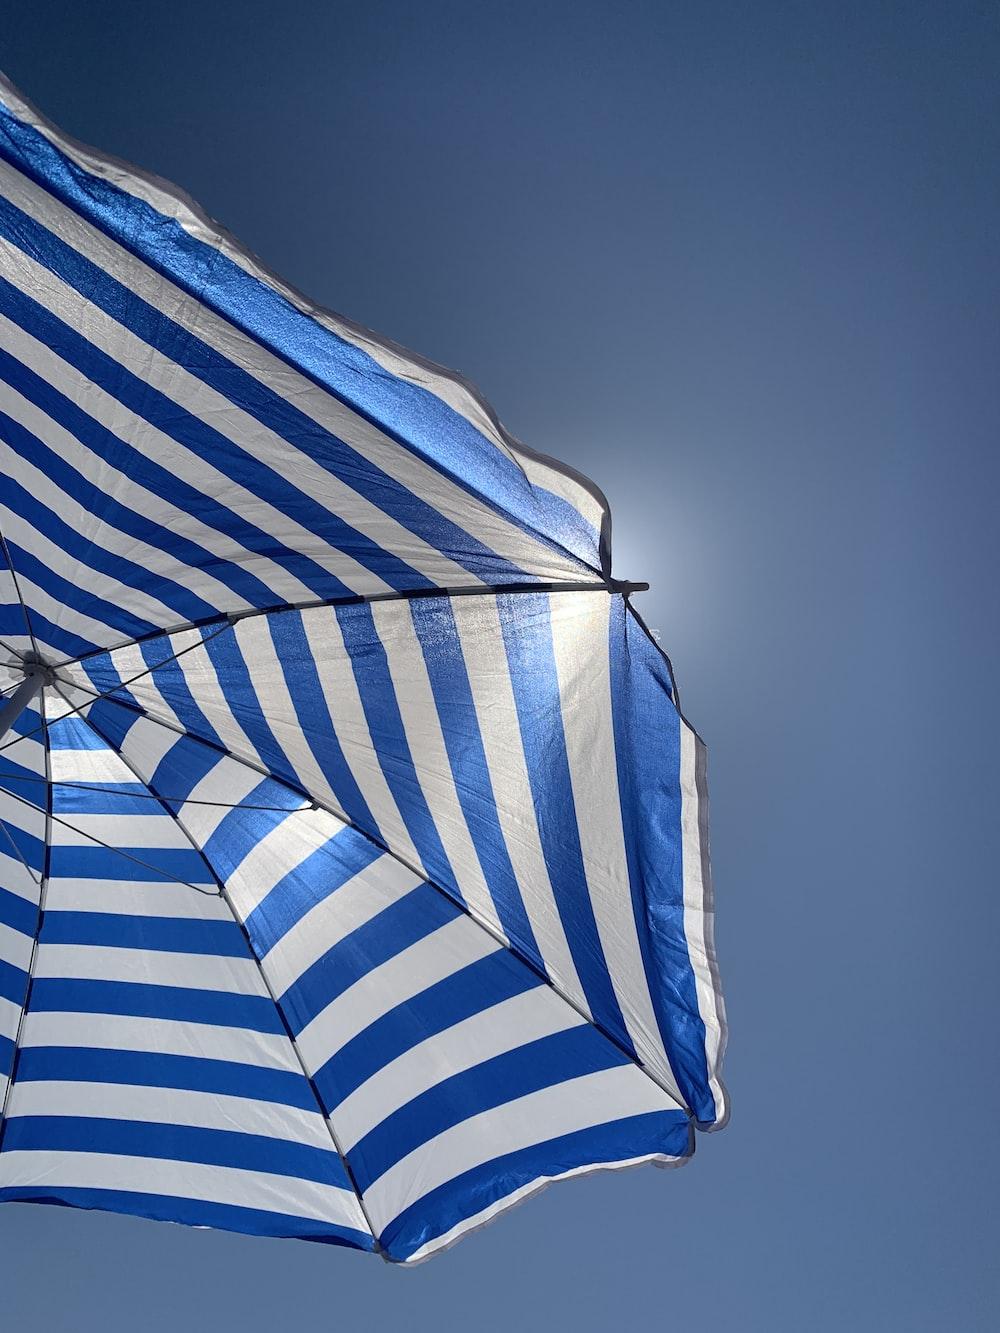 white and blue umbrella